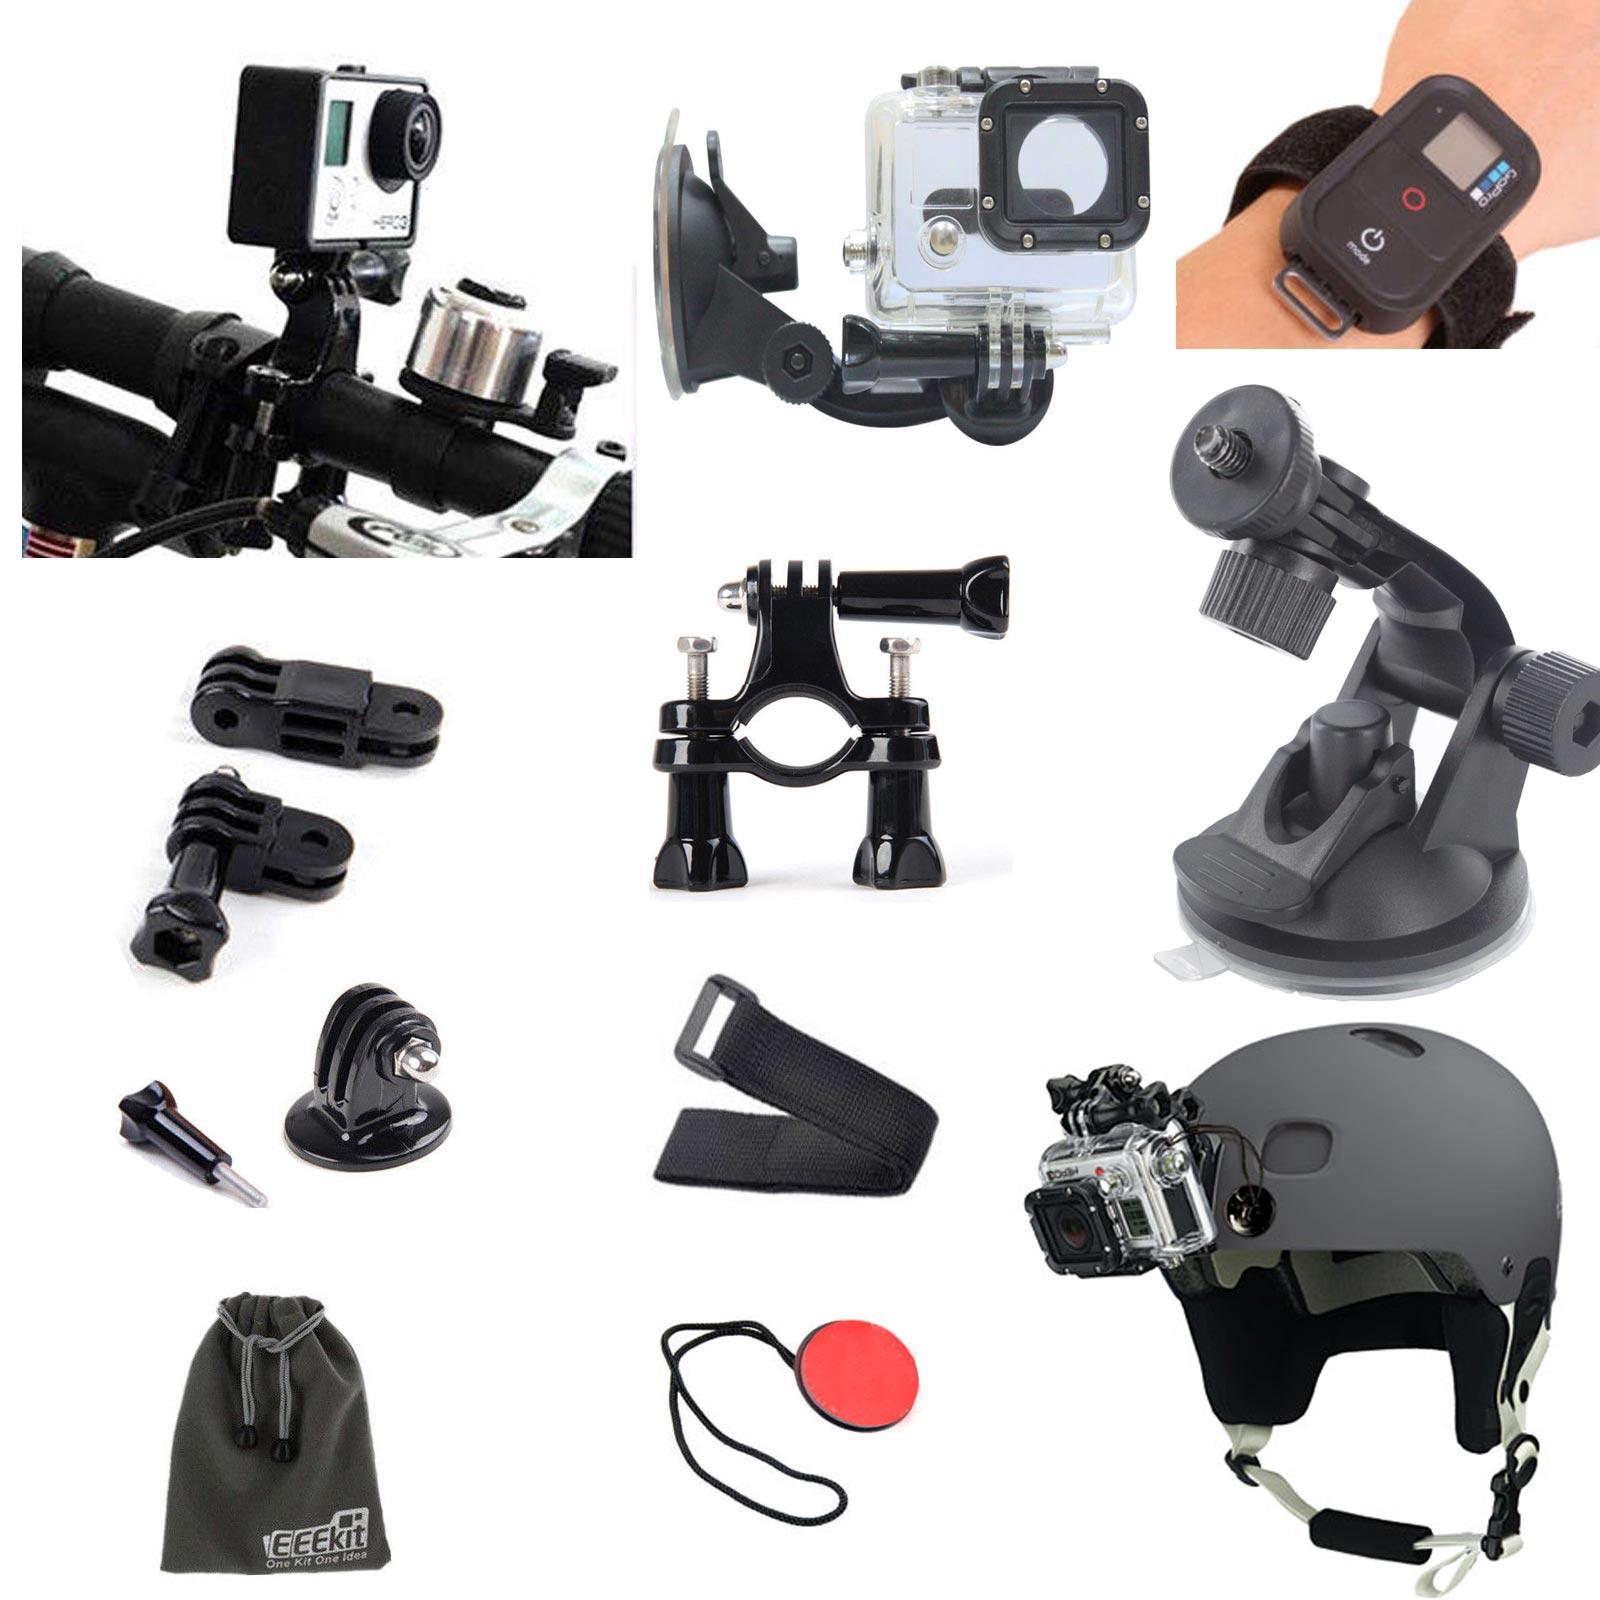 EEEKit GoPro HD Hero 3+/3/2 Camera, Car Holder+Bike Handlebar Mount+Wrist Strap